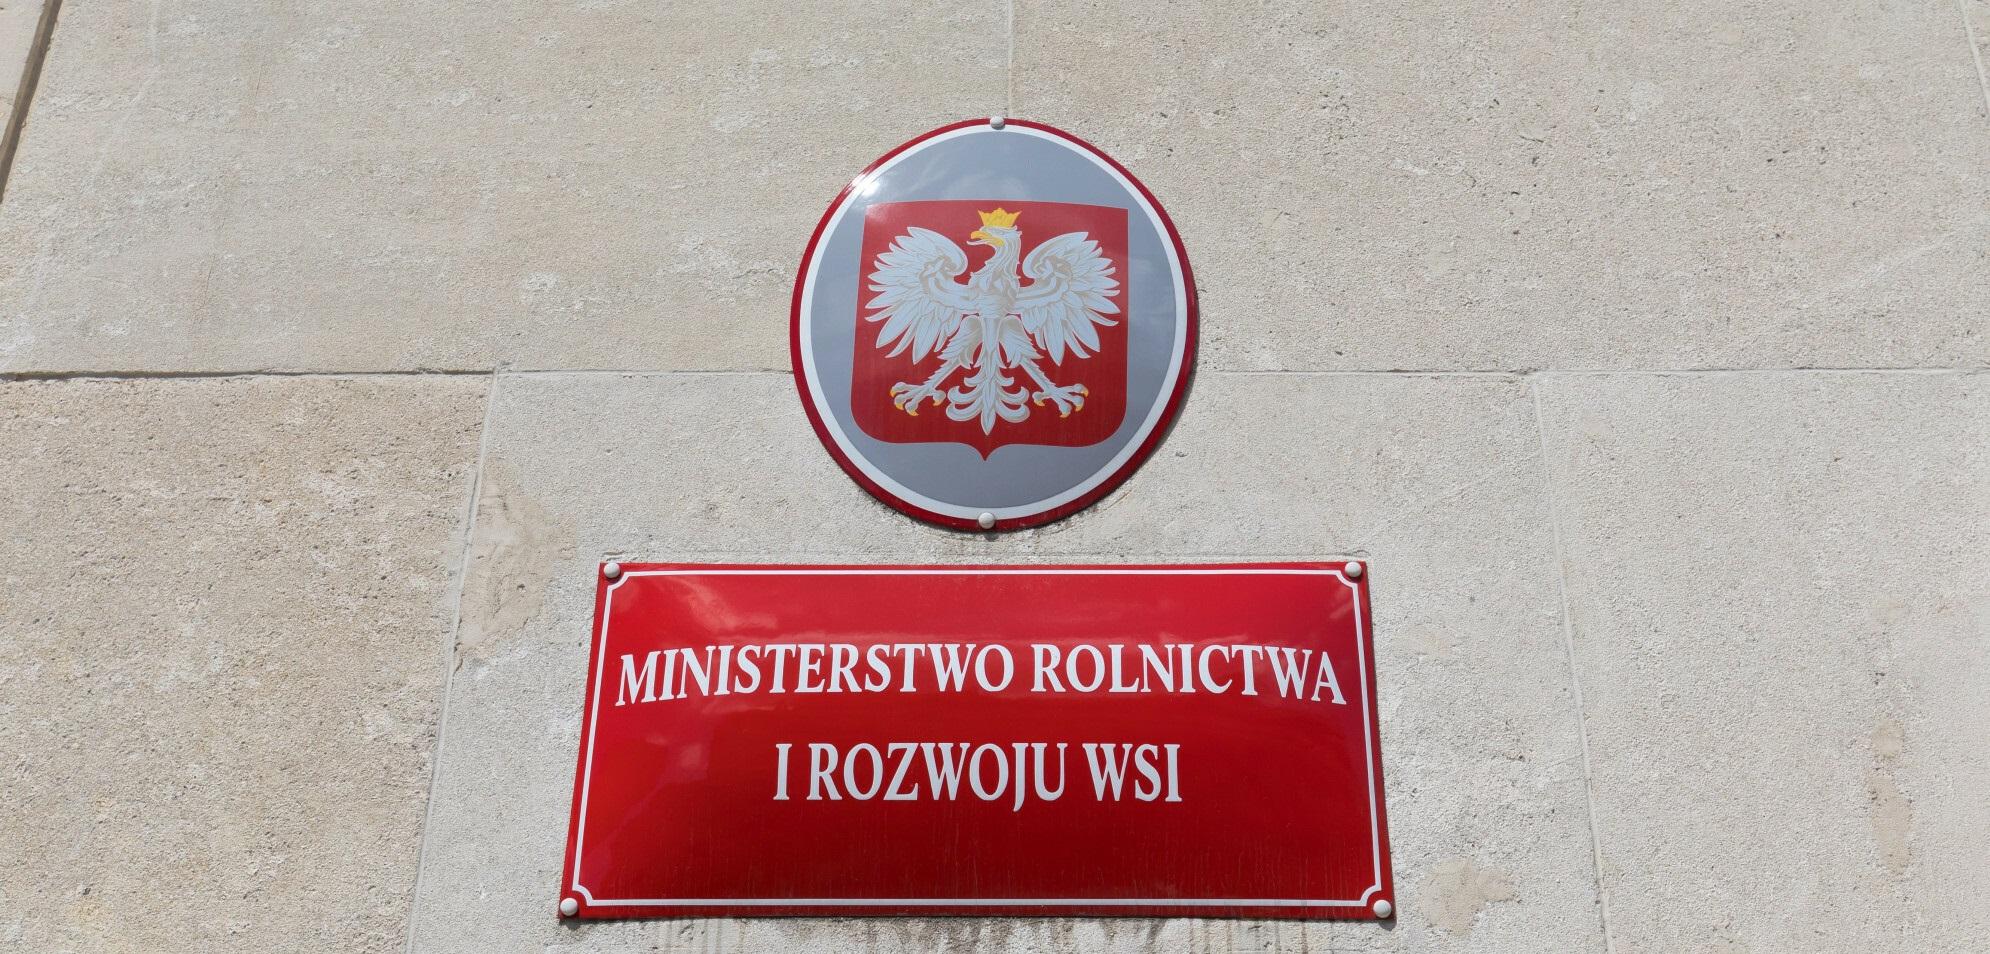 Ministerstwo Rolnictwa - tvp